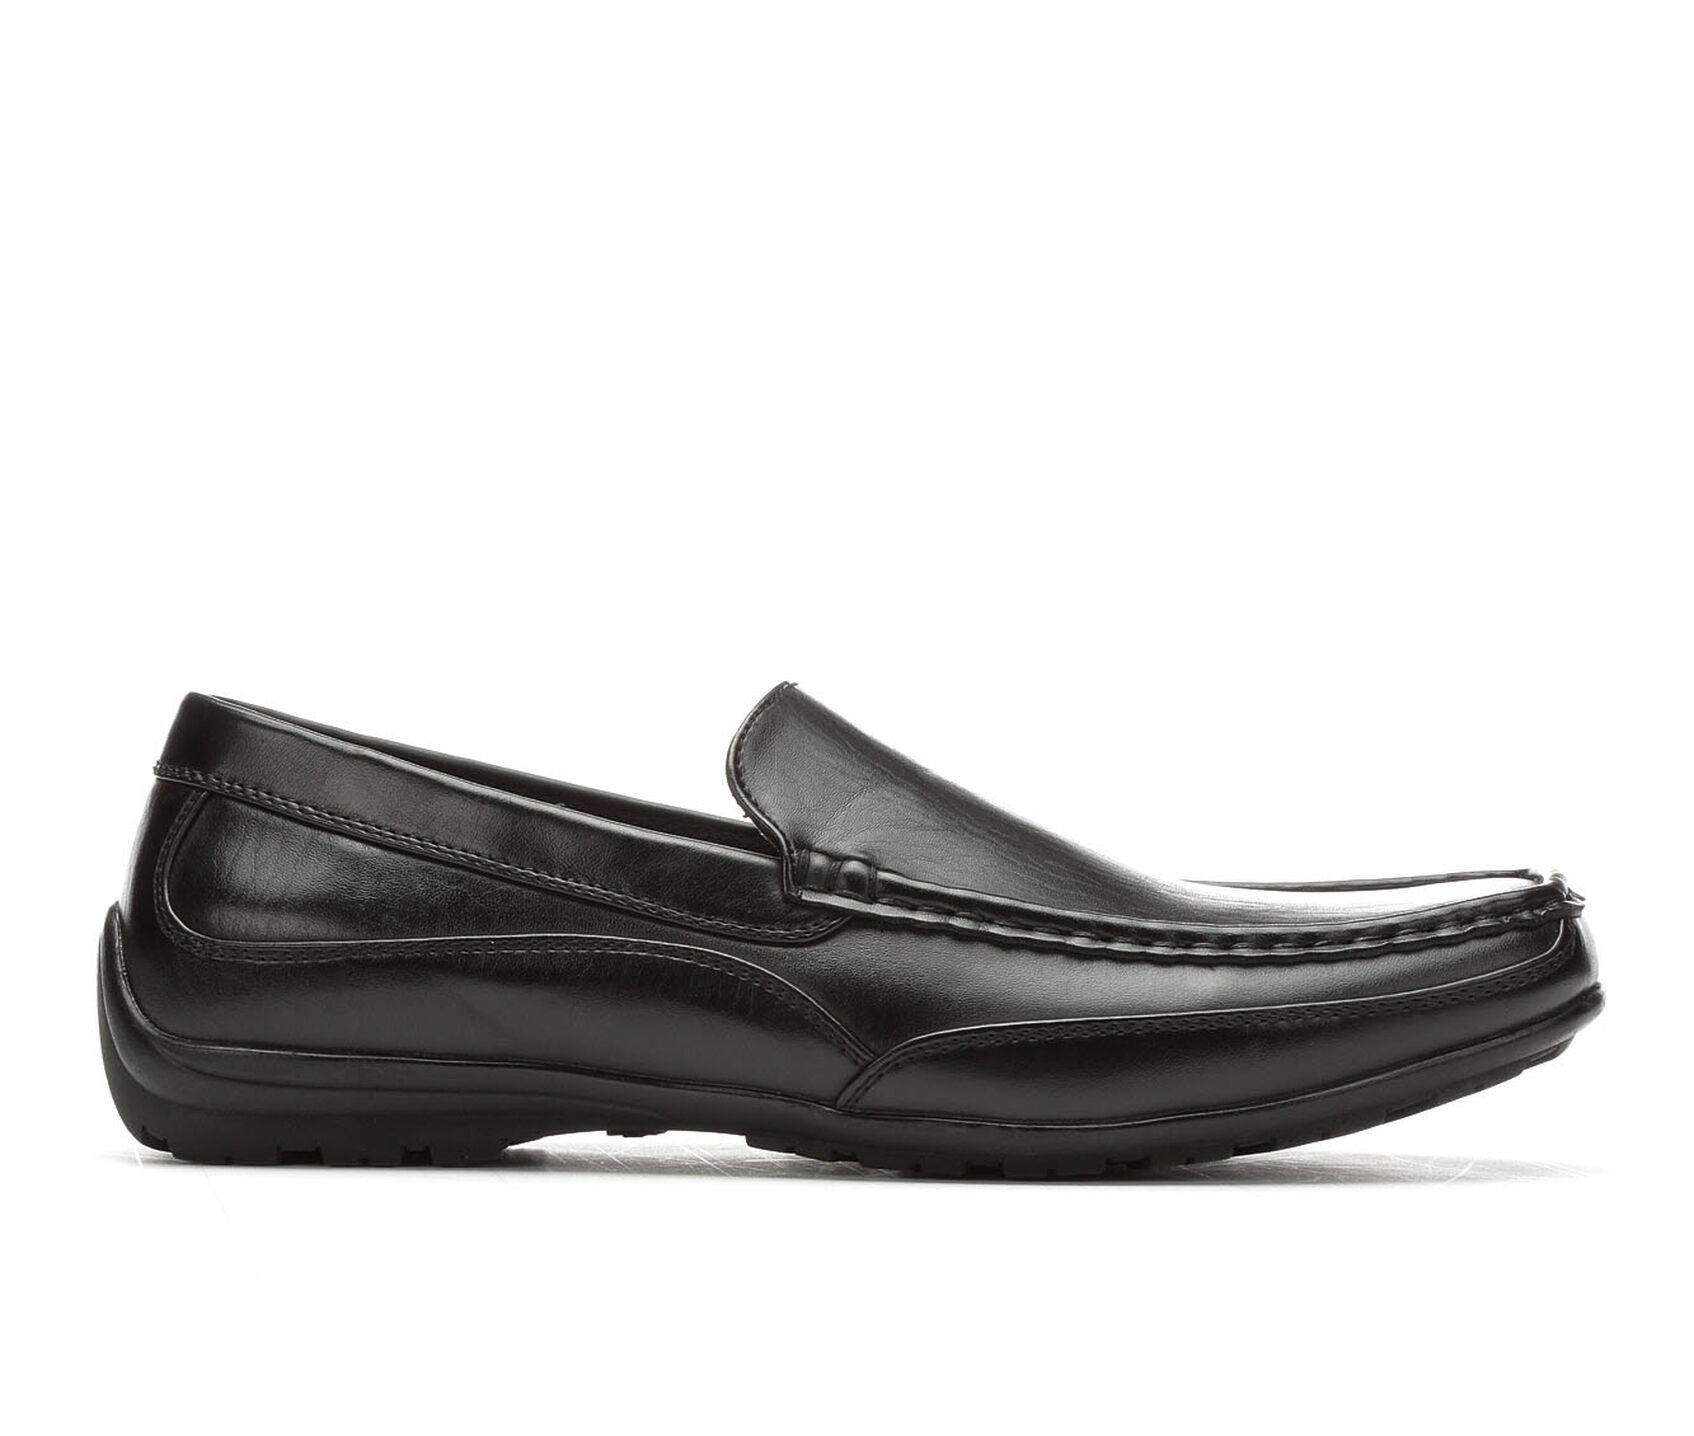 Mens Moccasins Shoe Carnival